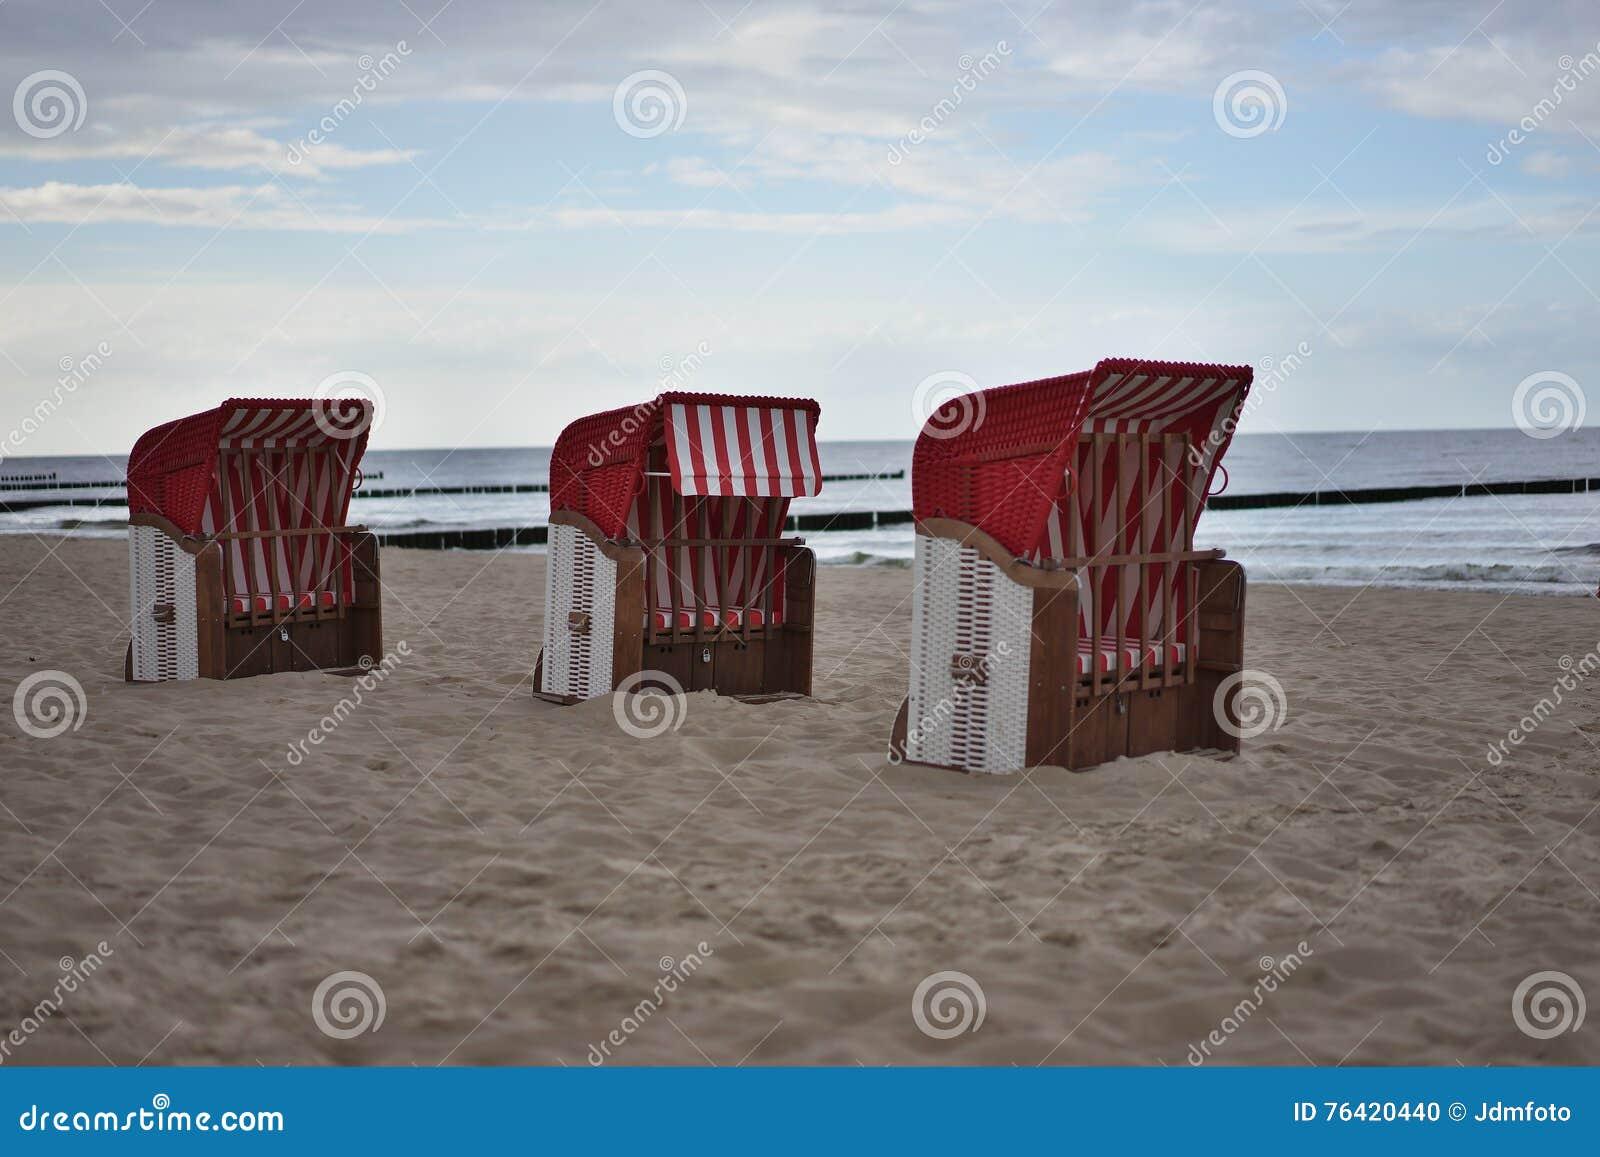 Sillas de playa silla playa loneta plegable xxcm silla - Sillas playa alcampo ...